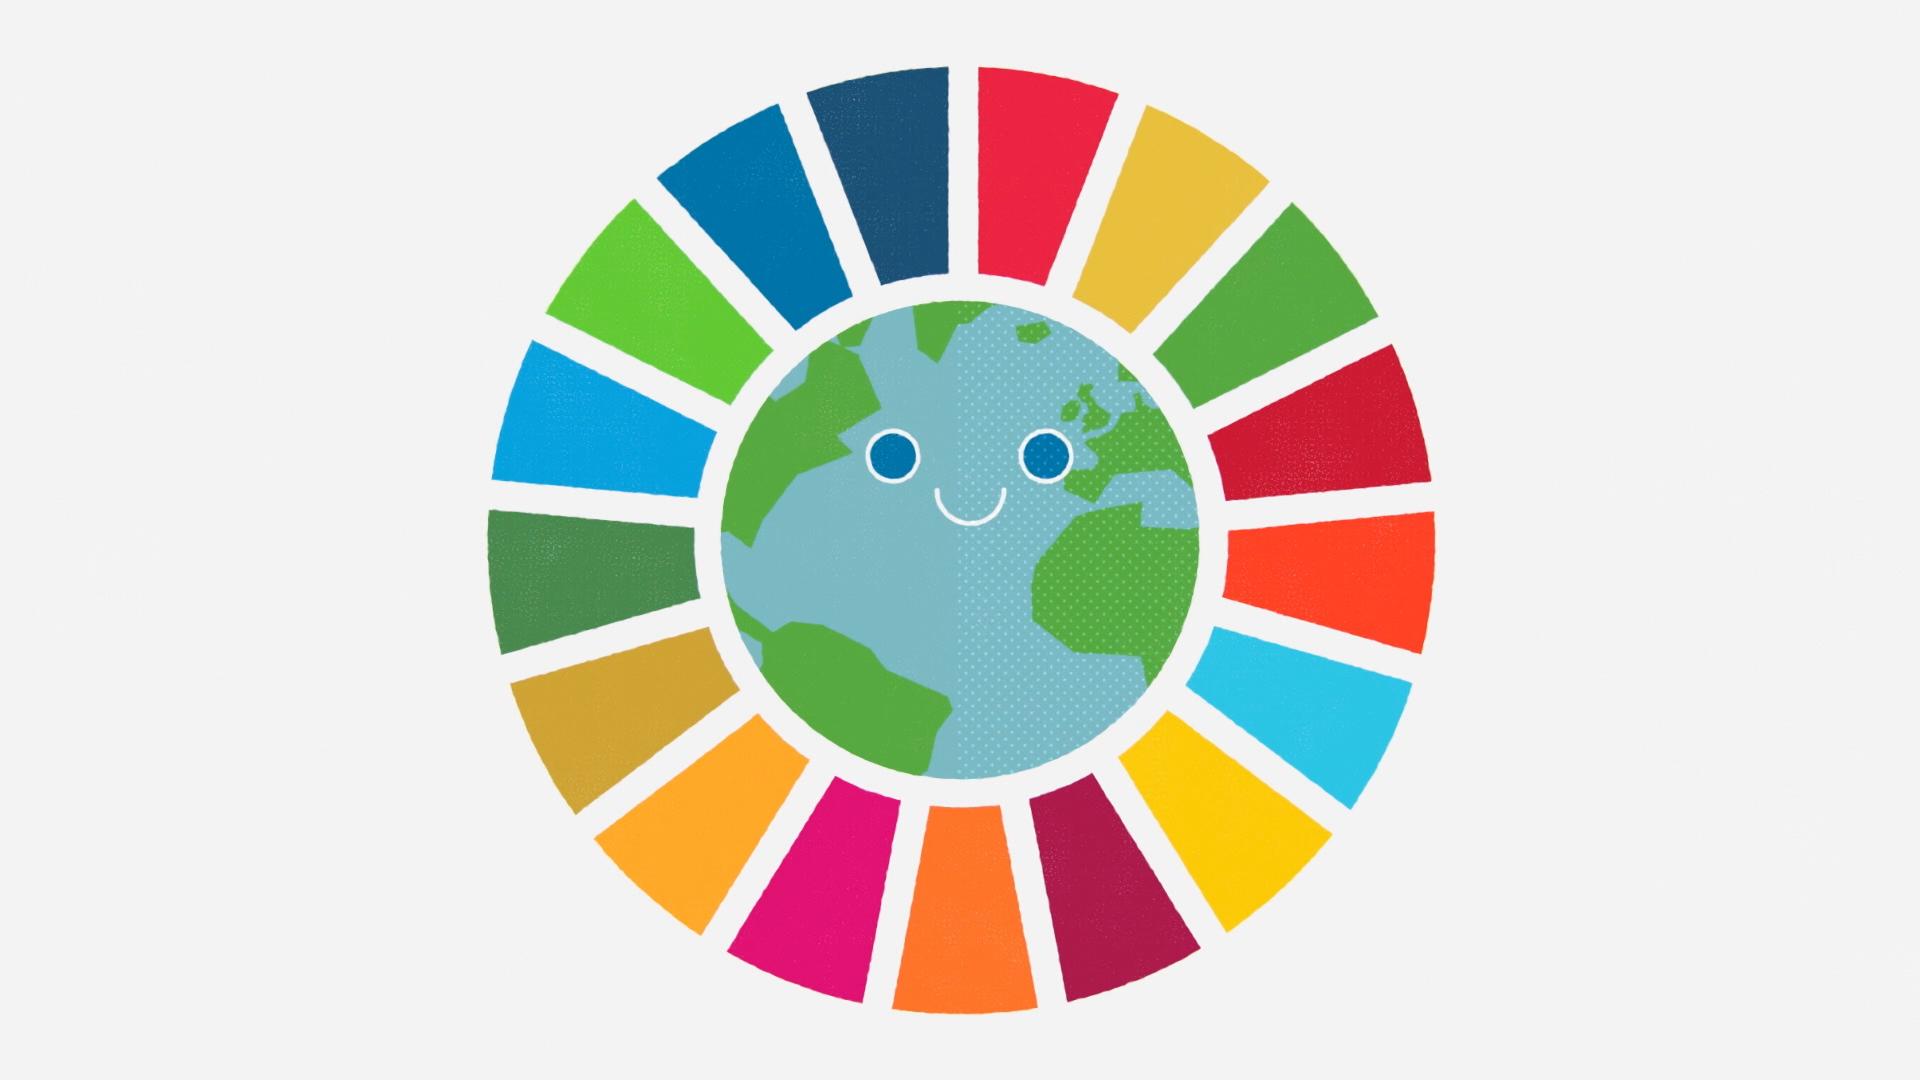 Tom___0005_Global Goals.jpg